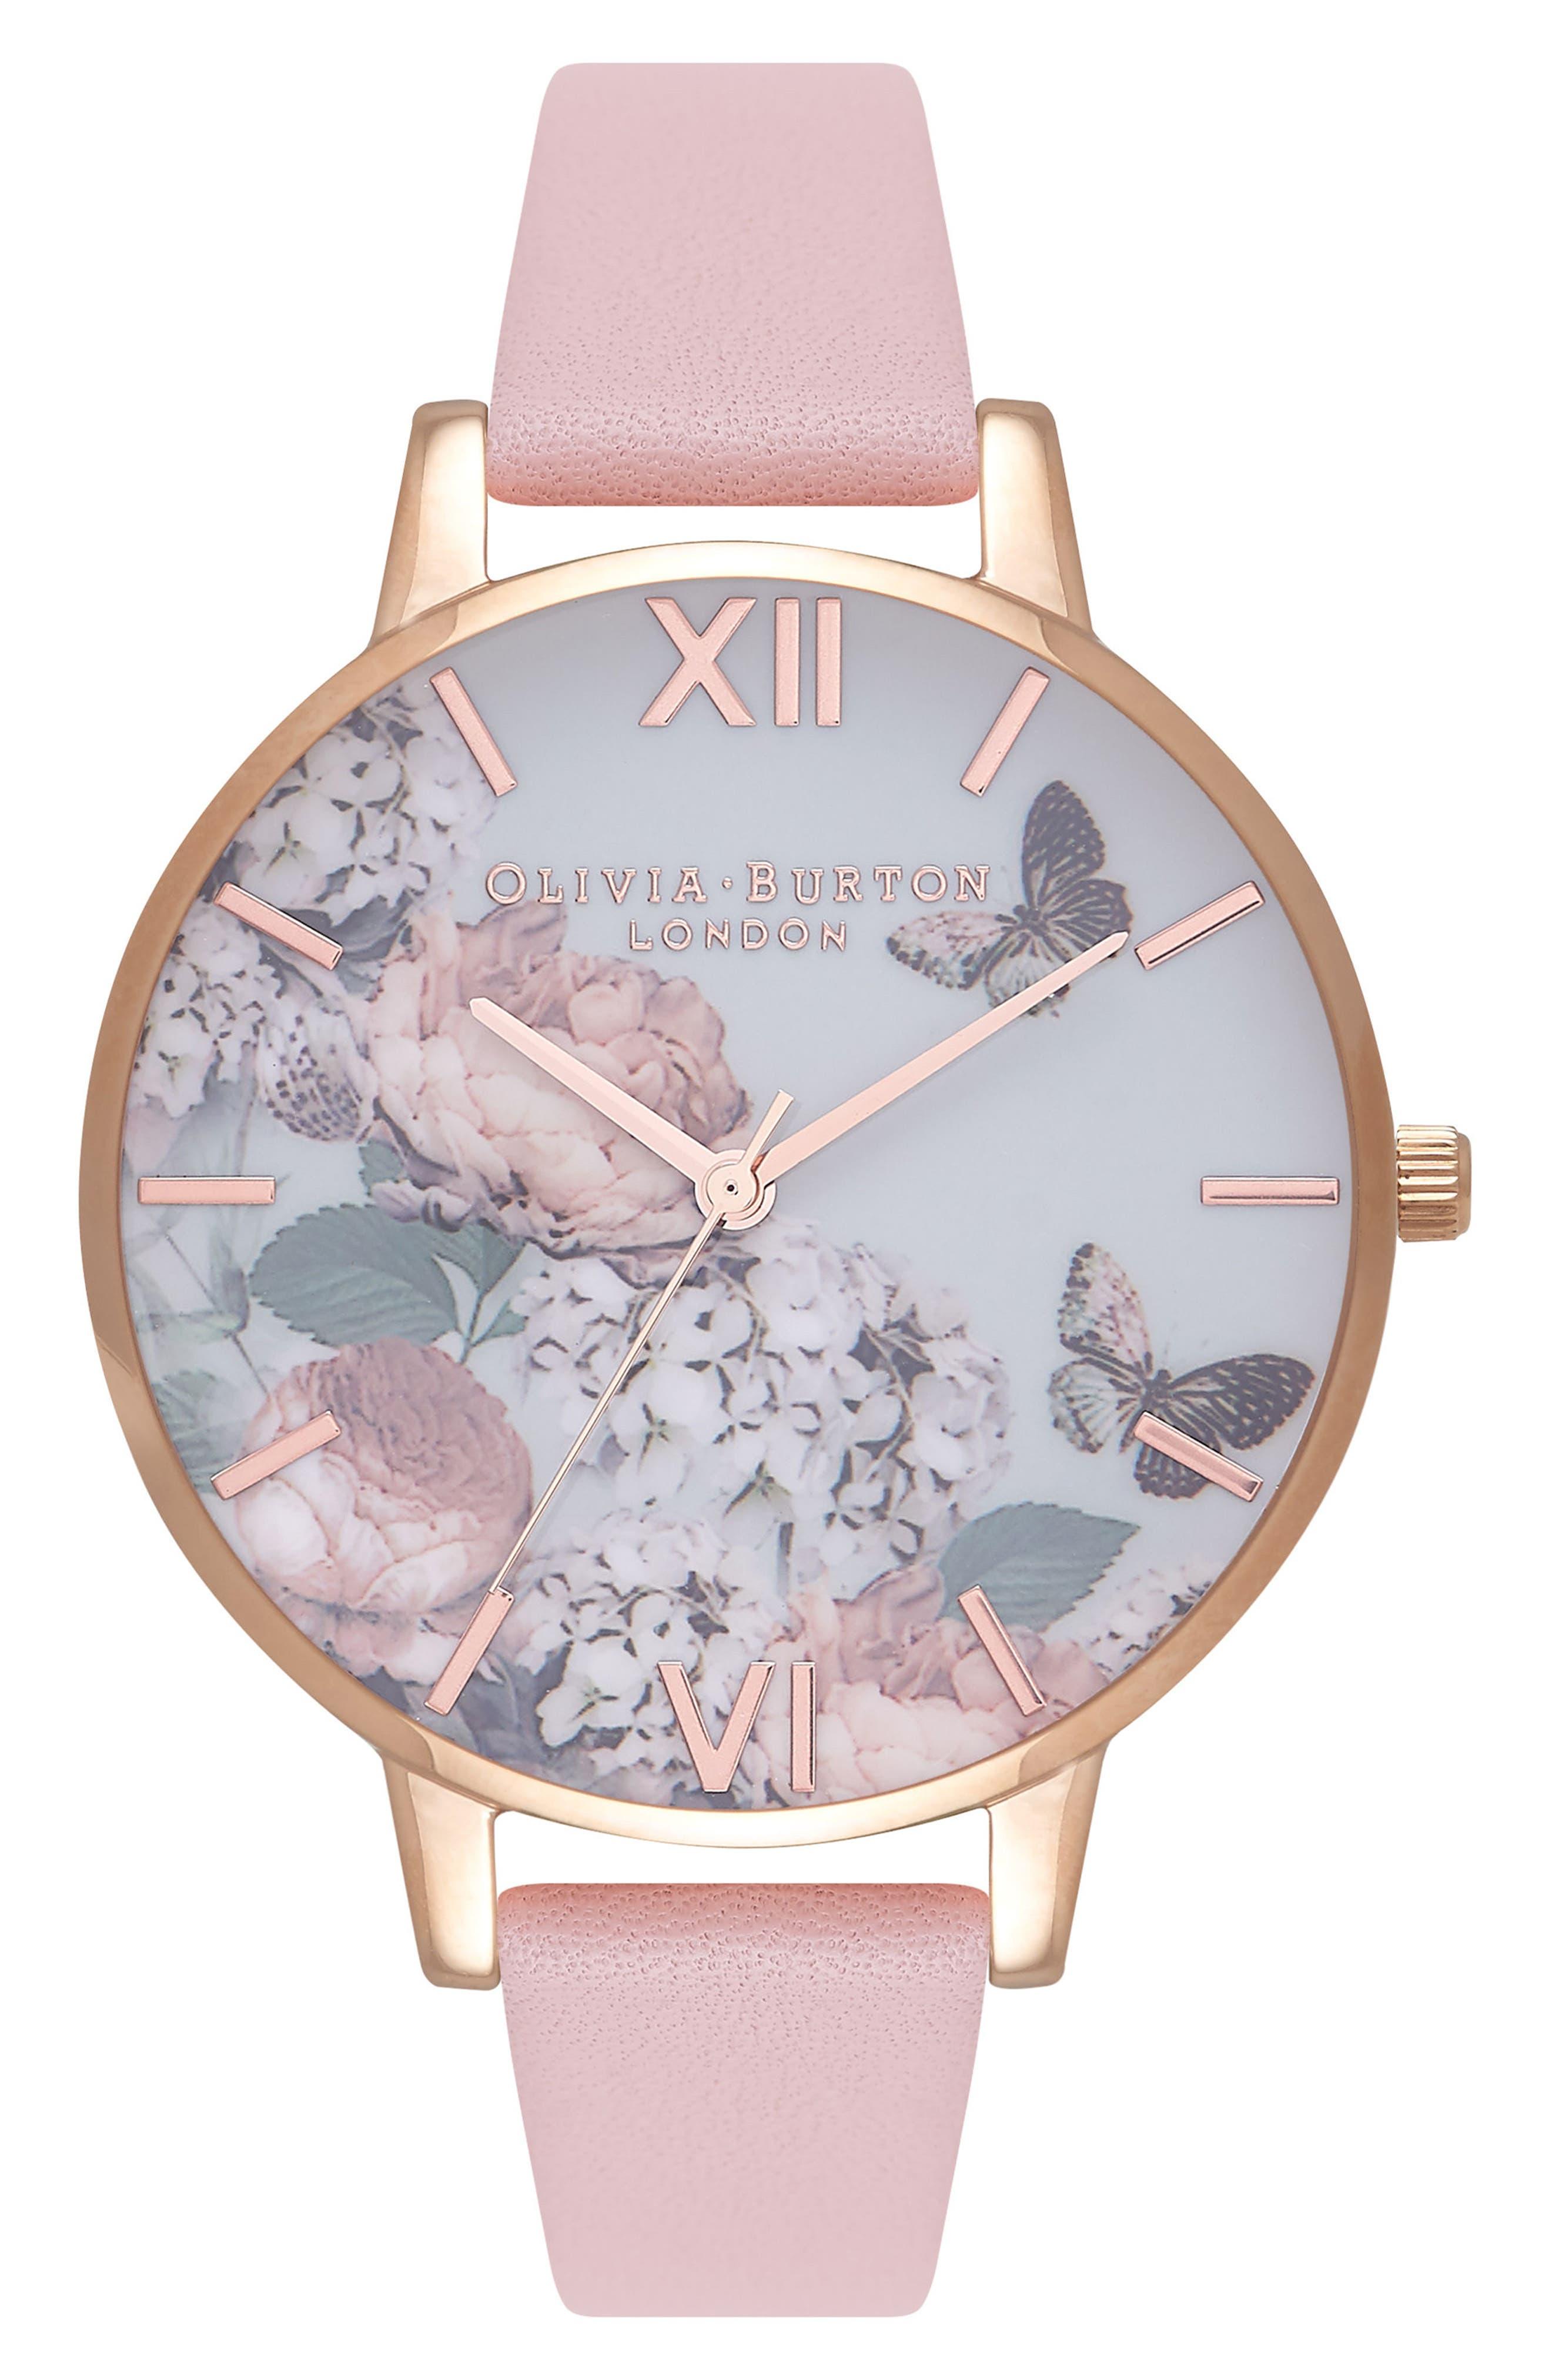 OLIVIA BURTON, Signature Florals Leather Strap Watch, 38mm, Main thumbnail 1, color, 650